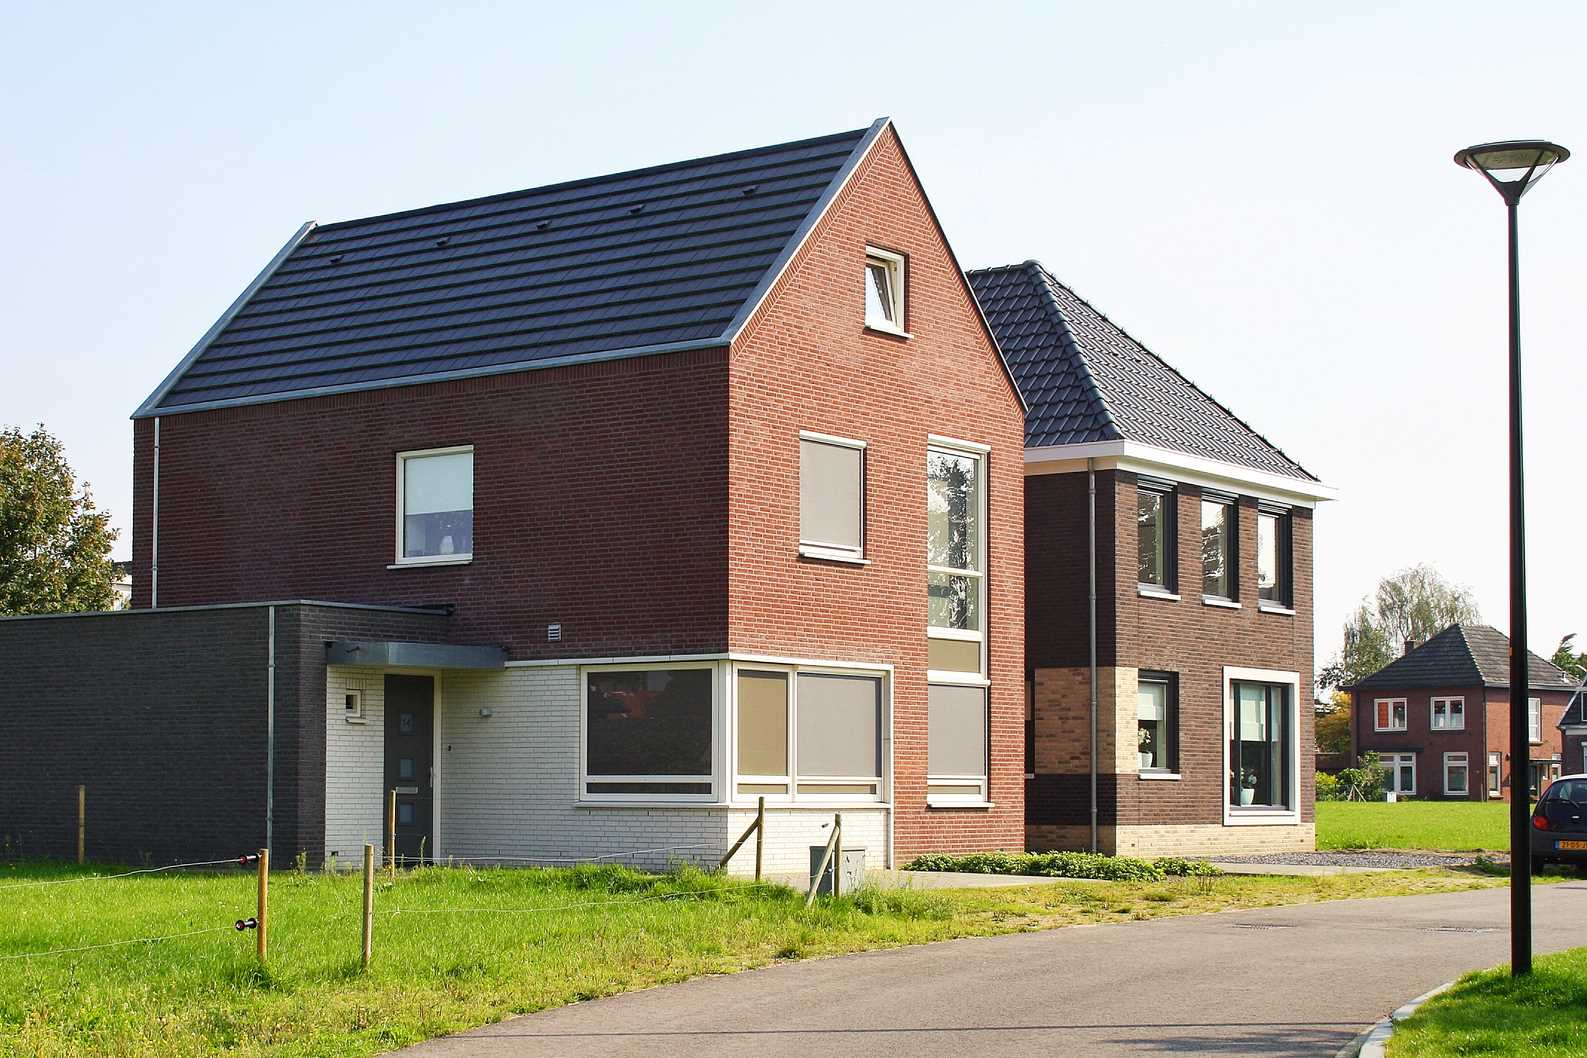 www.renescholtenarchitectuur.nl-project 07-f05 (Kopie)